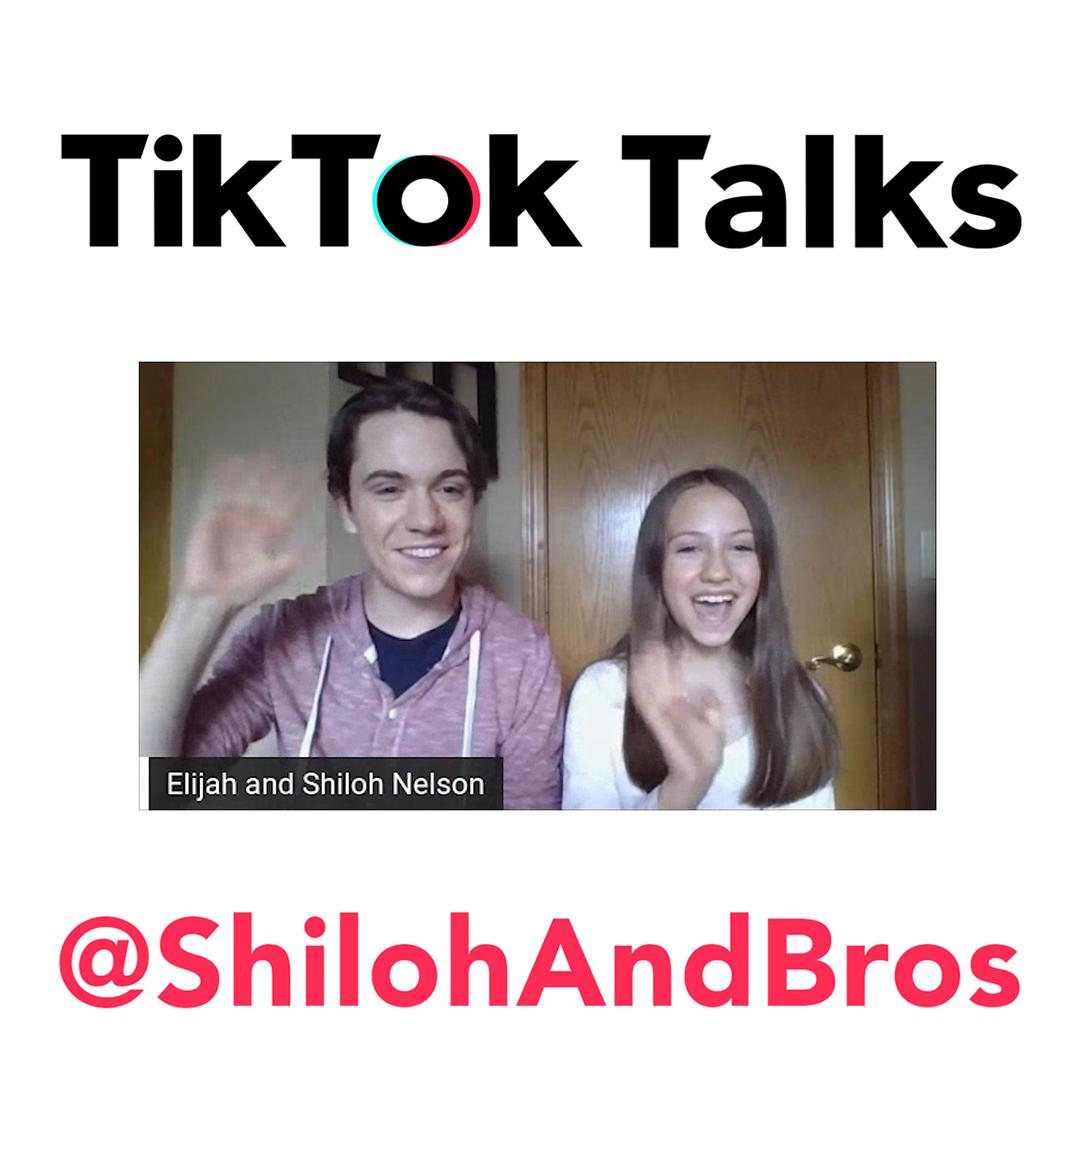 shiloh and bros mobile copy